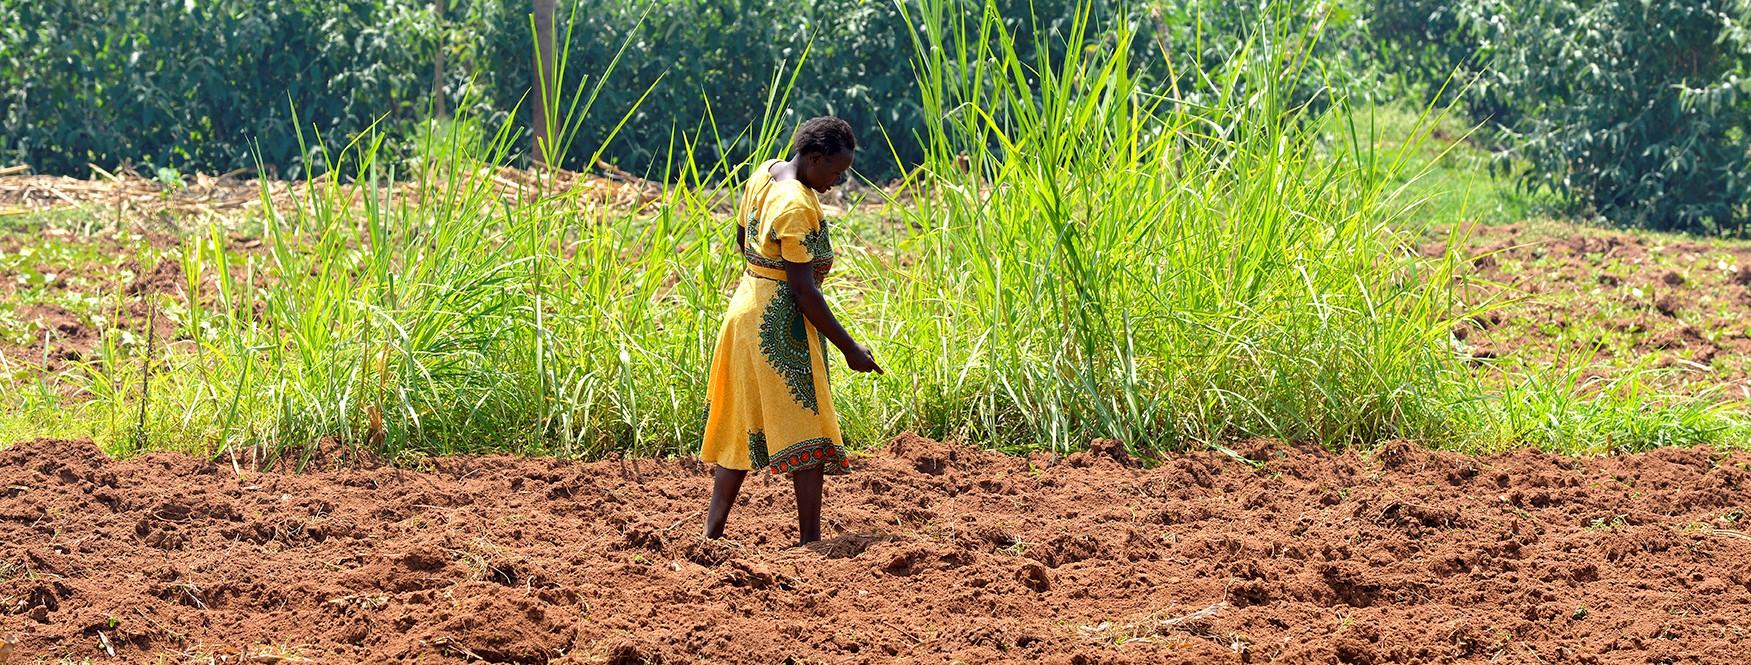 Livelihoods Venture at COP14:<br> 4 questions to Bernard Giraud on land restoration